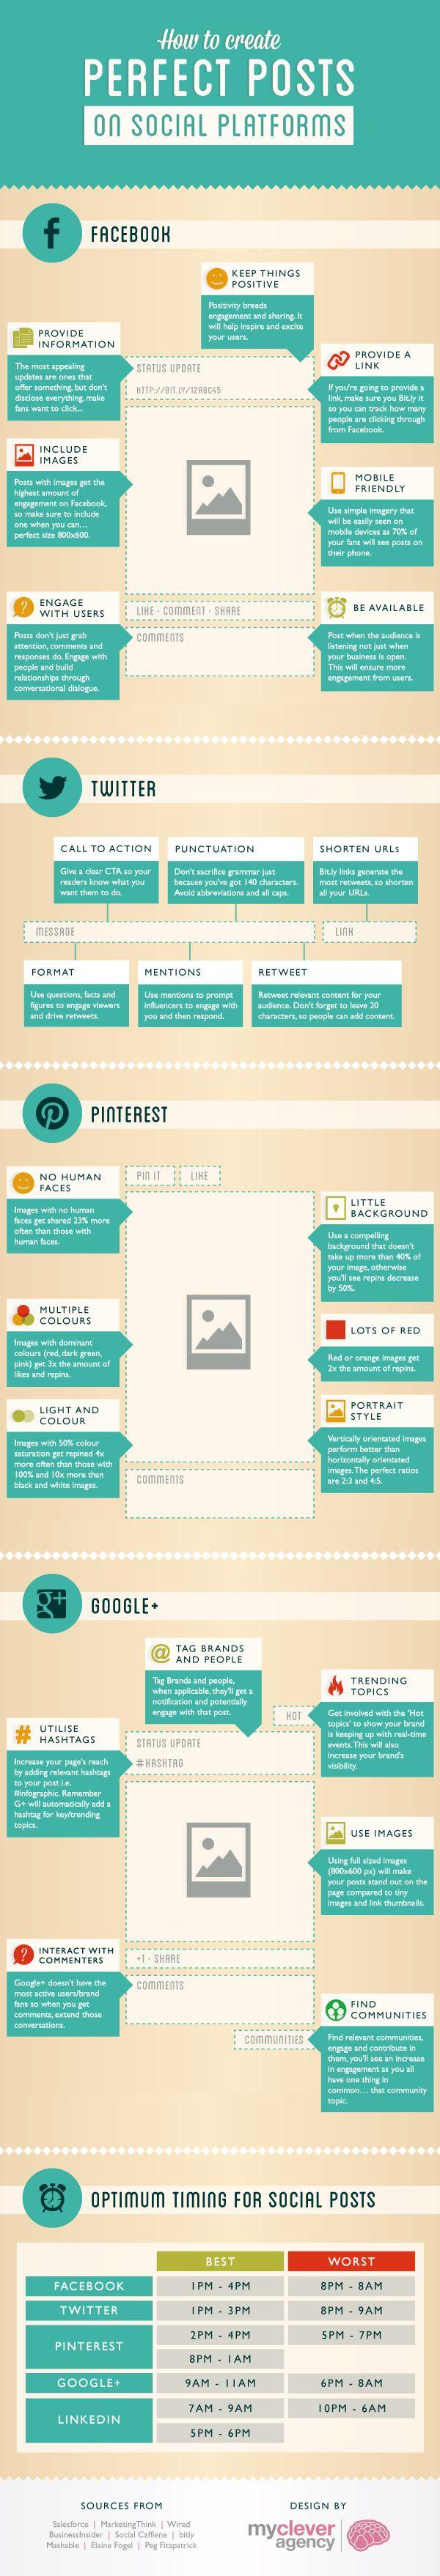 Creare un post perfetto per ogni social network - How to create perfect post to social platform